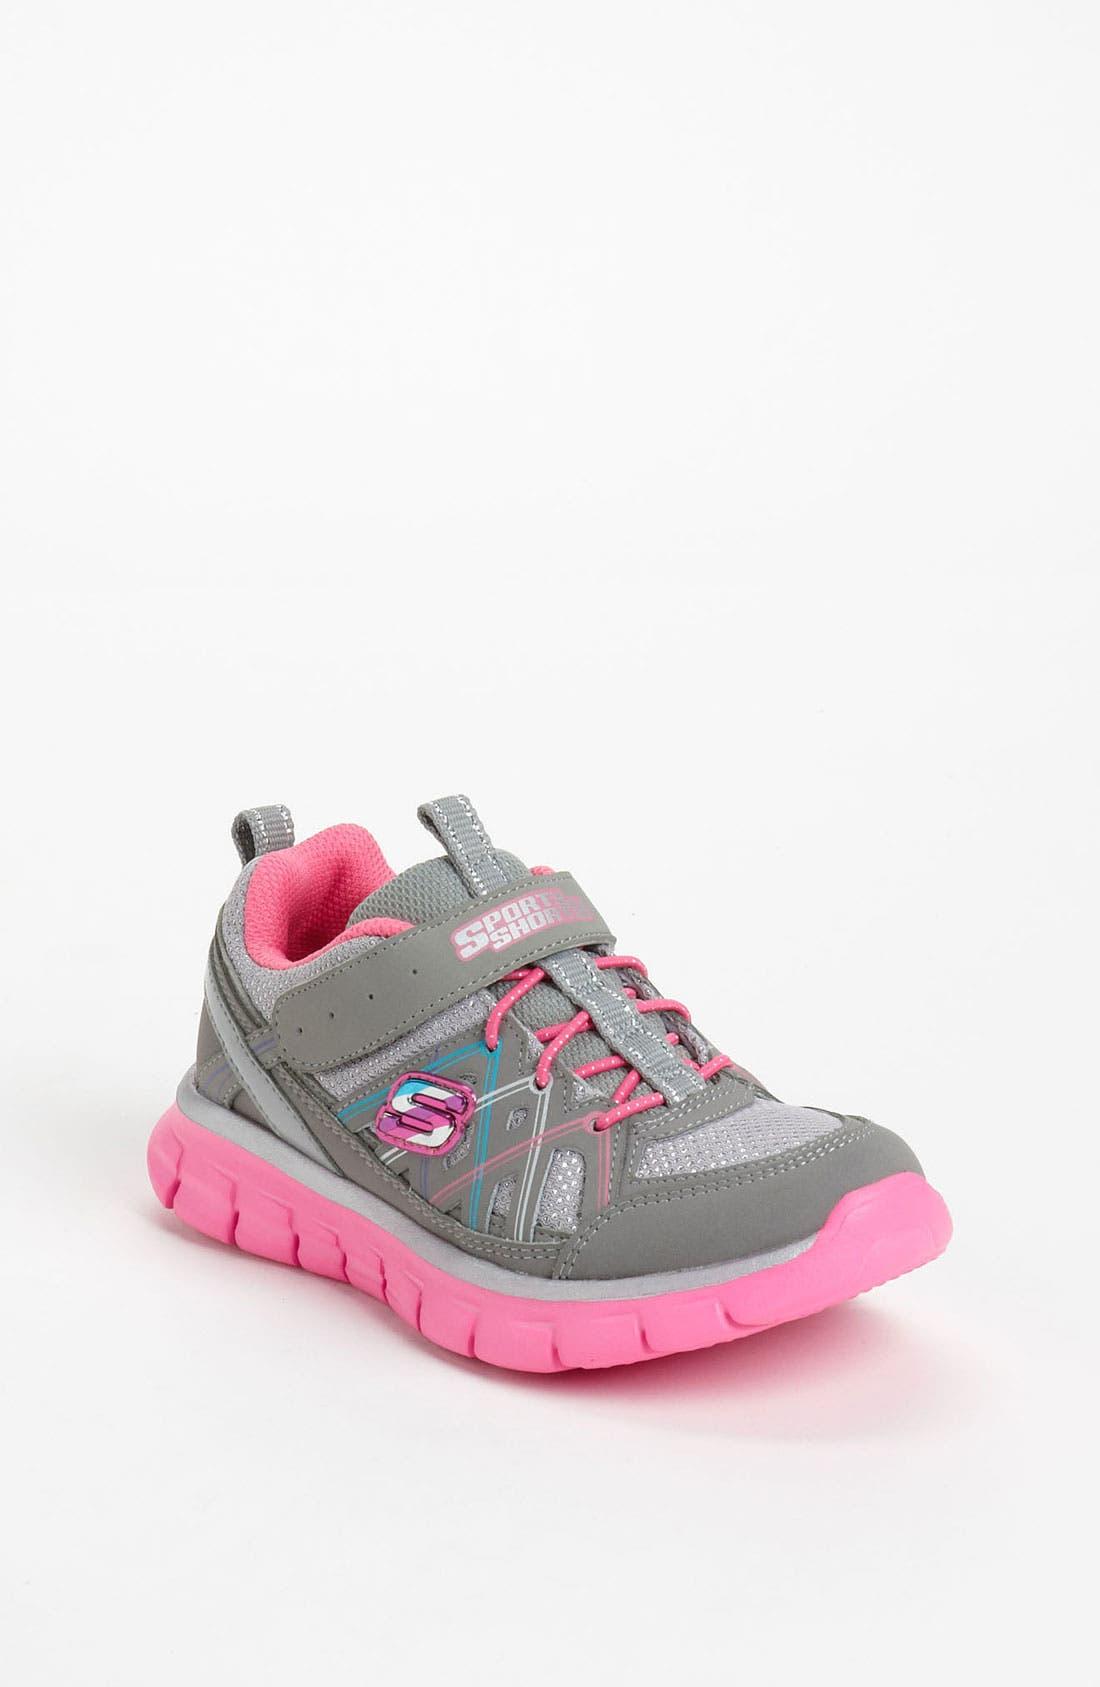 Main Image - SKECHERS 'Synergy Aerials' Sneaker (Toddler, Little Kid & Big Kid)